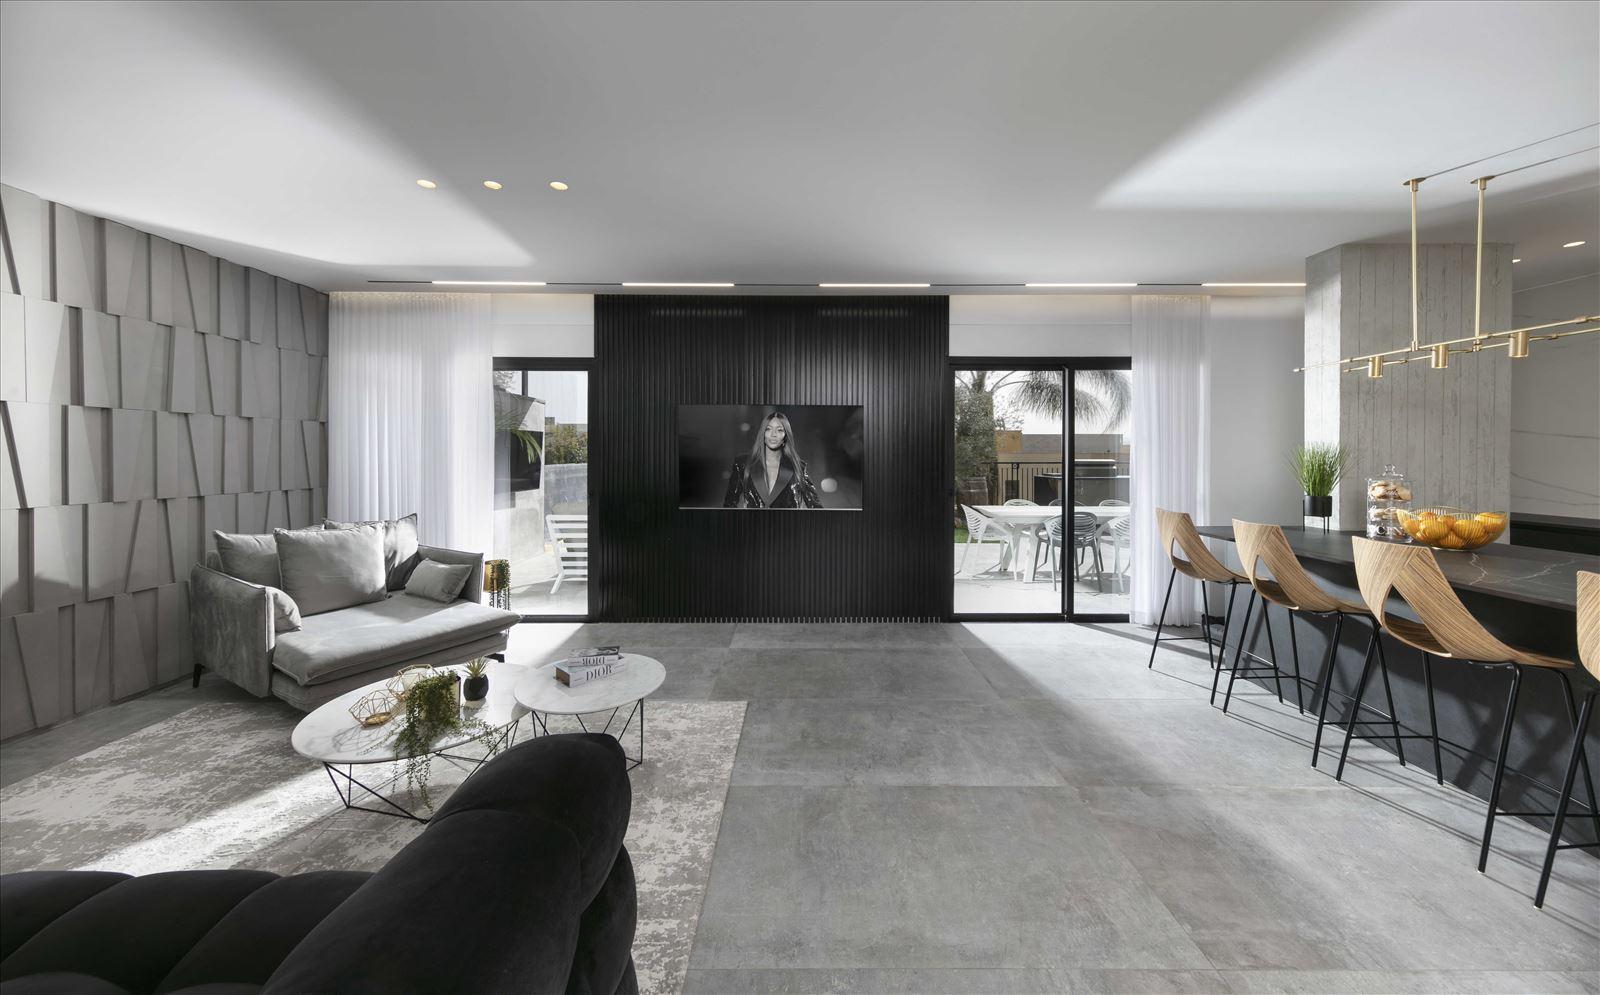 Lighting project private house פרויקט תאורה בסלון על ידי דורי קמחי